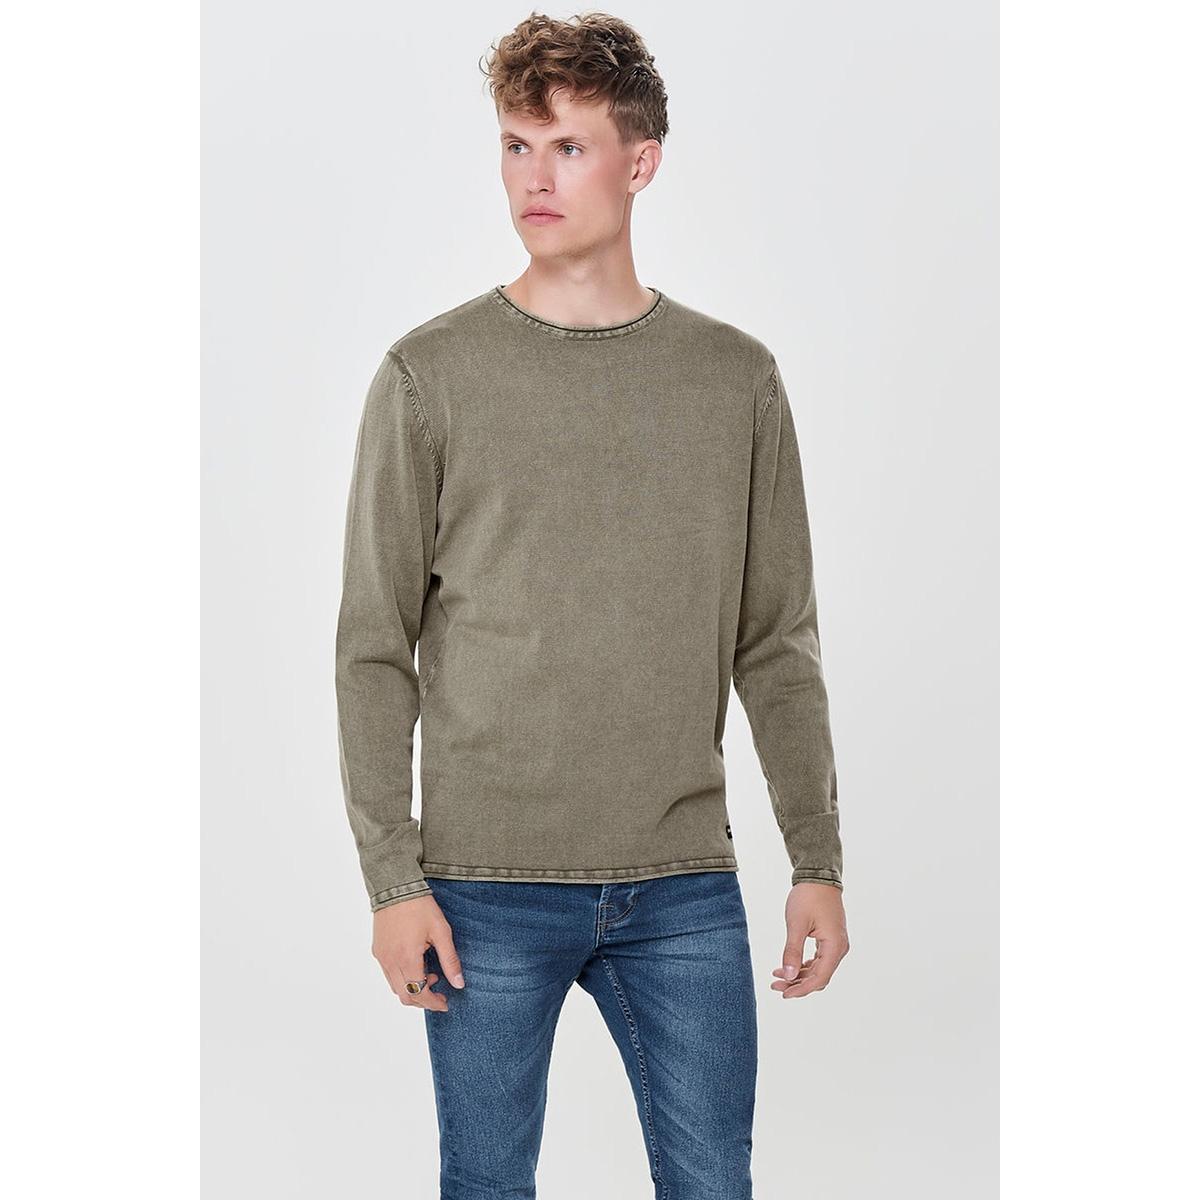 onsgarson 12  wash crew neck knit noos 22006806 only & sons trui deep lichen green